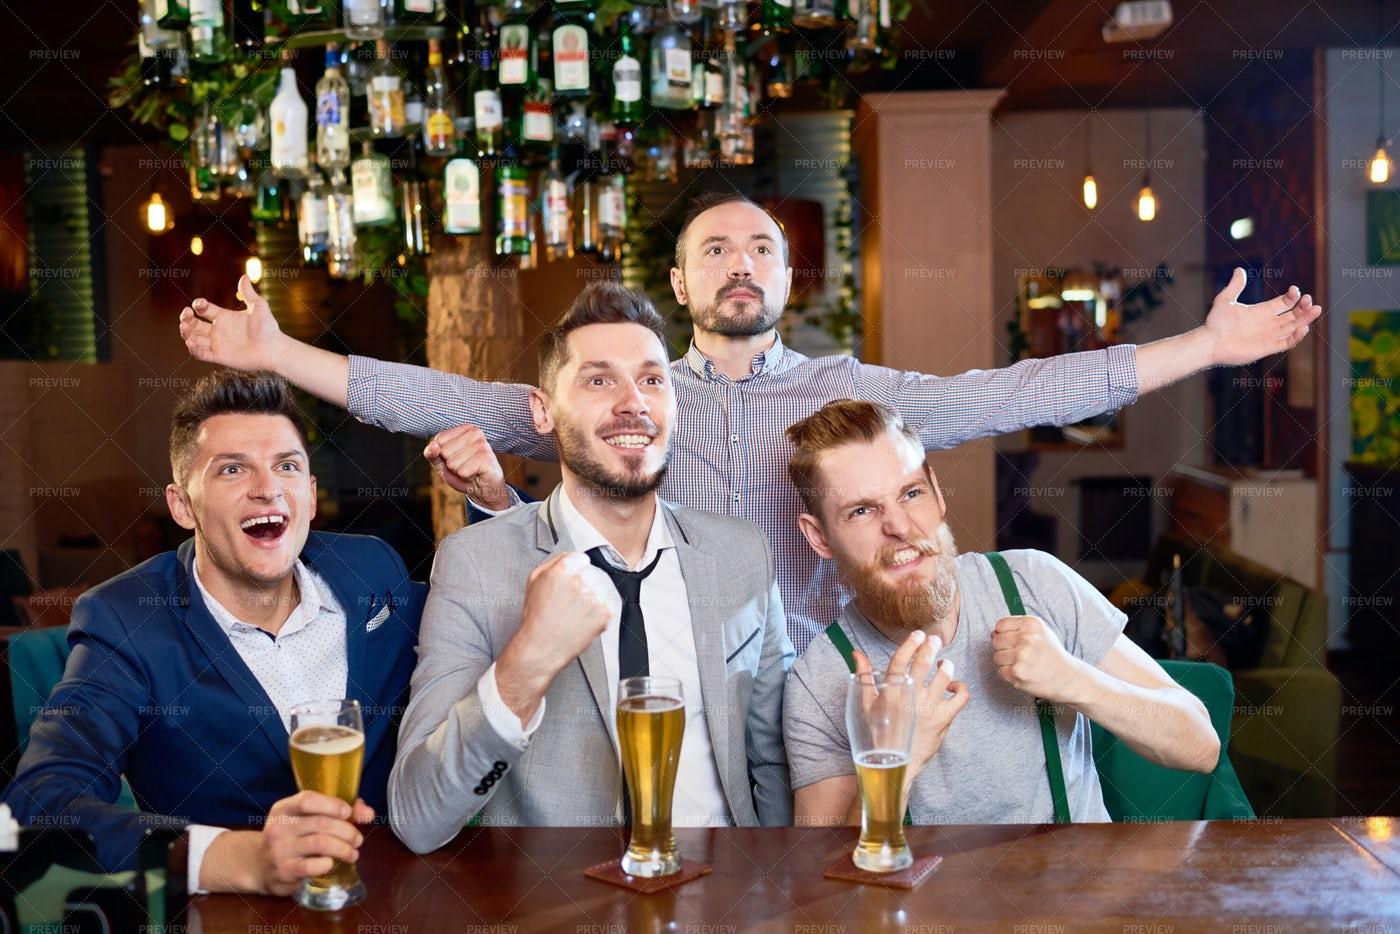 Football Fans Celebrating Victory: Stock Photos